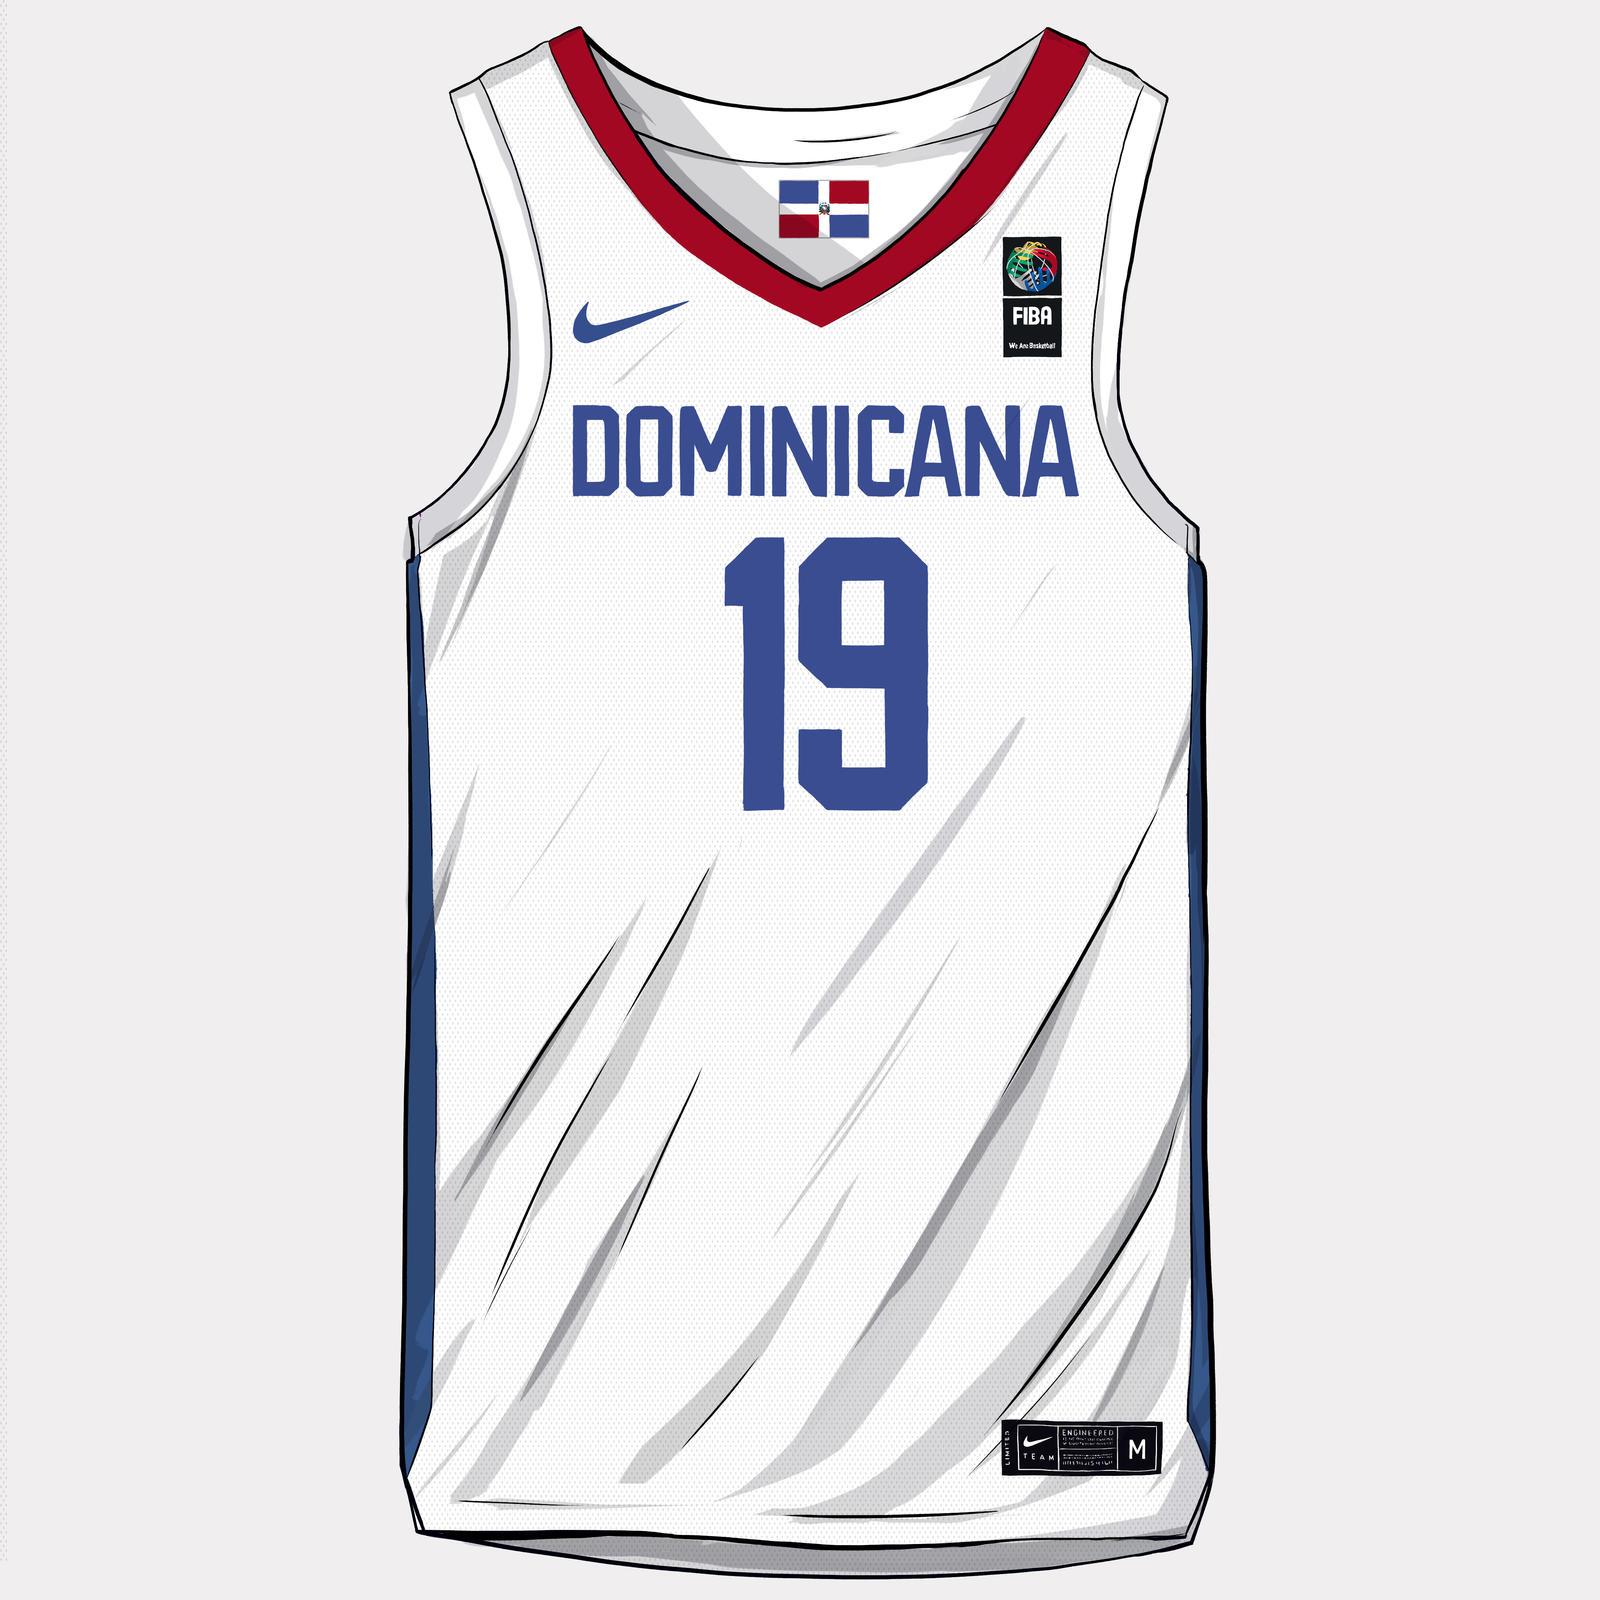 nike-news-dominican-republic-national-team-kit-2019-illustration-1x1_2_89511.jpg